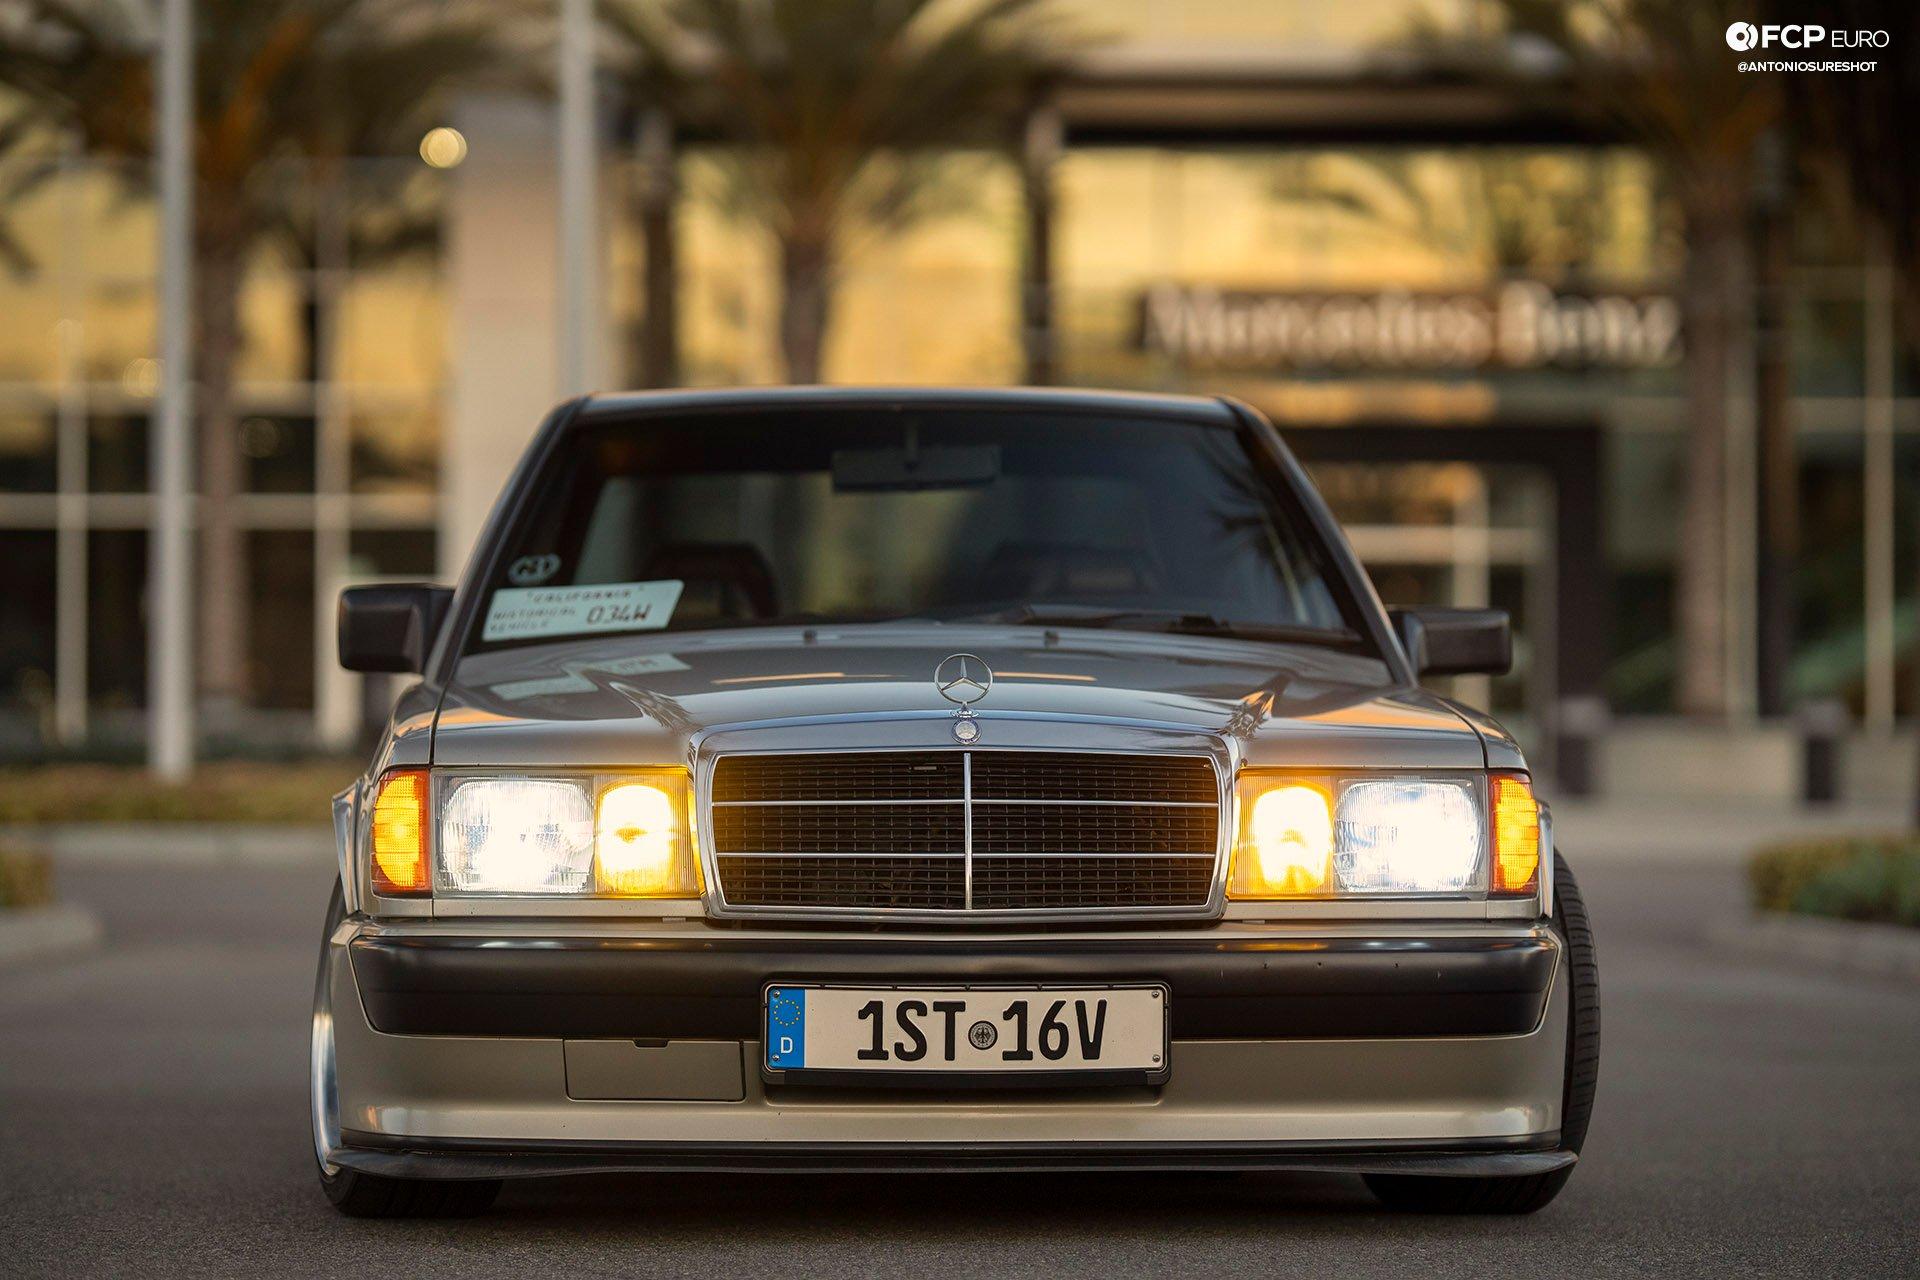 Mercedes Benz 190E 2.3 16v Cosworth EOSR1554